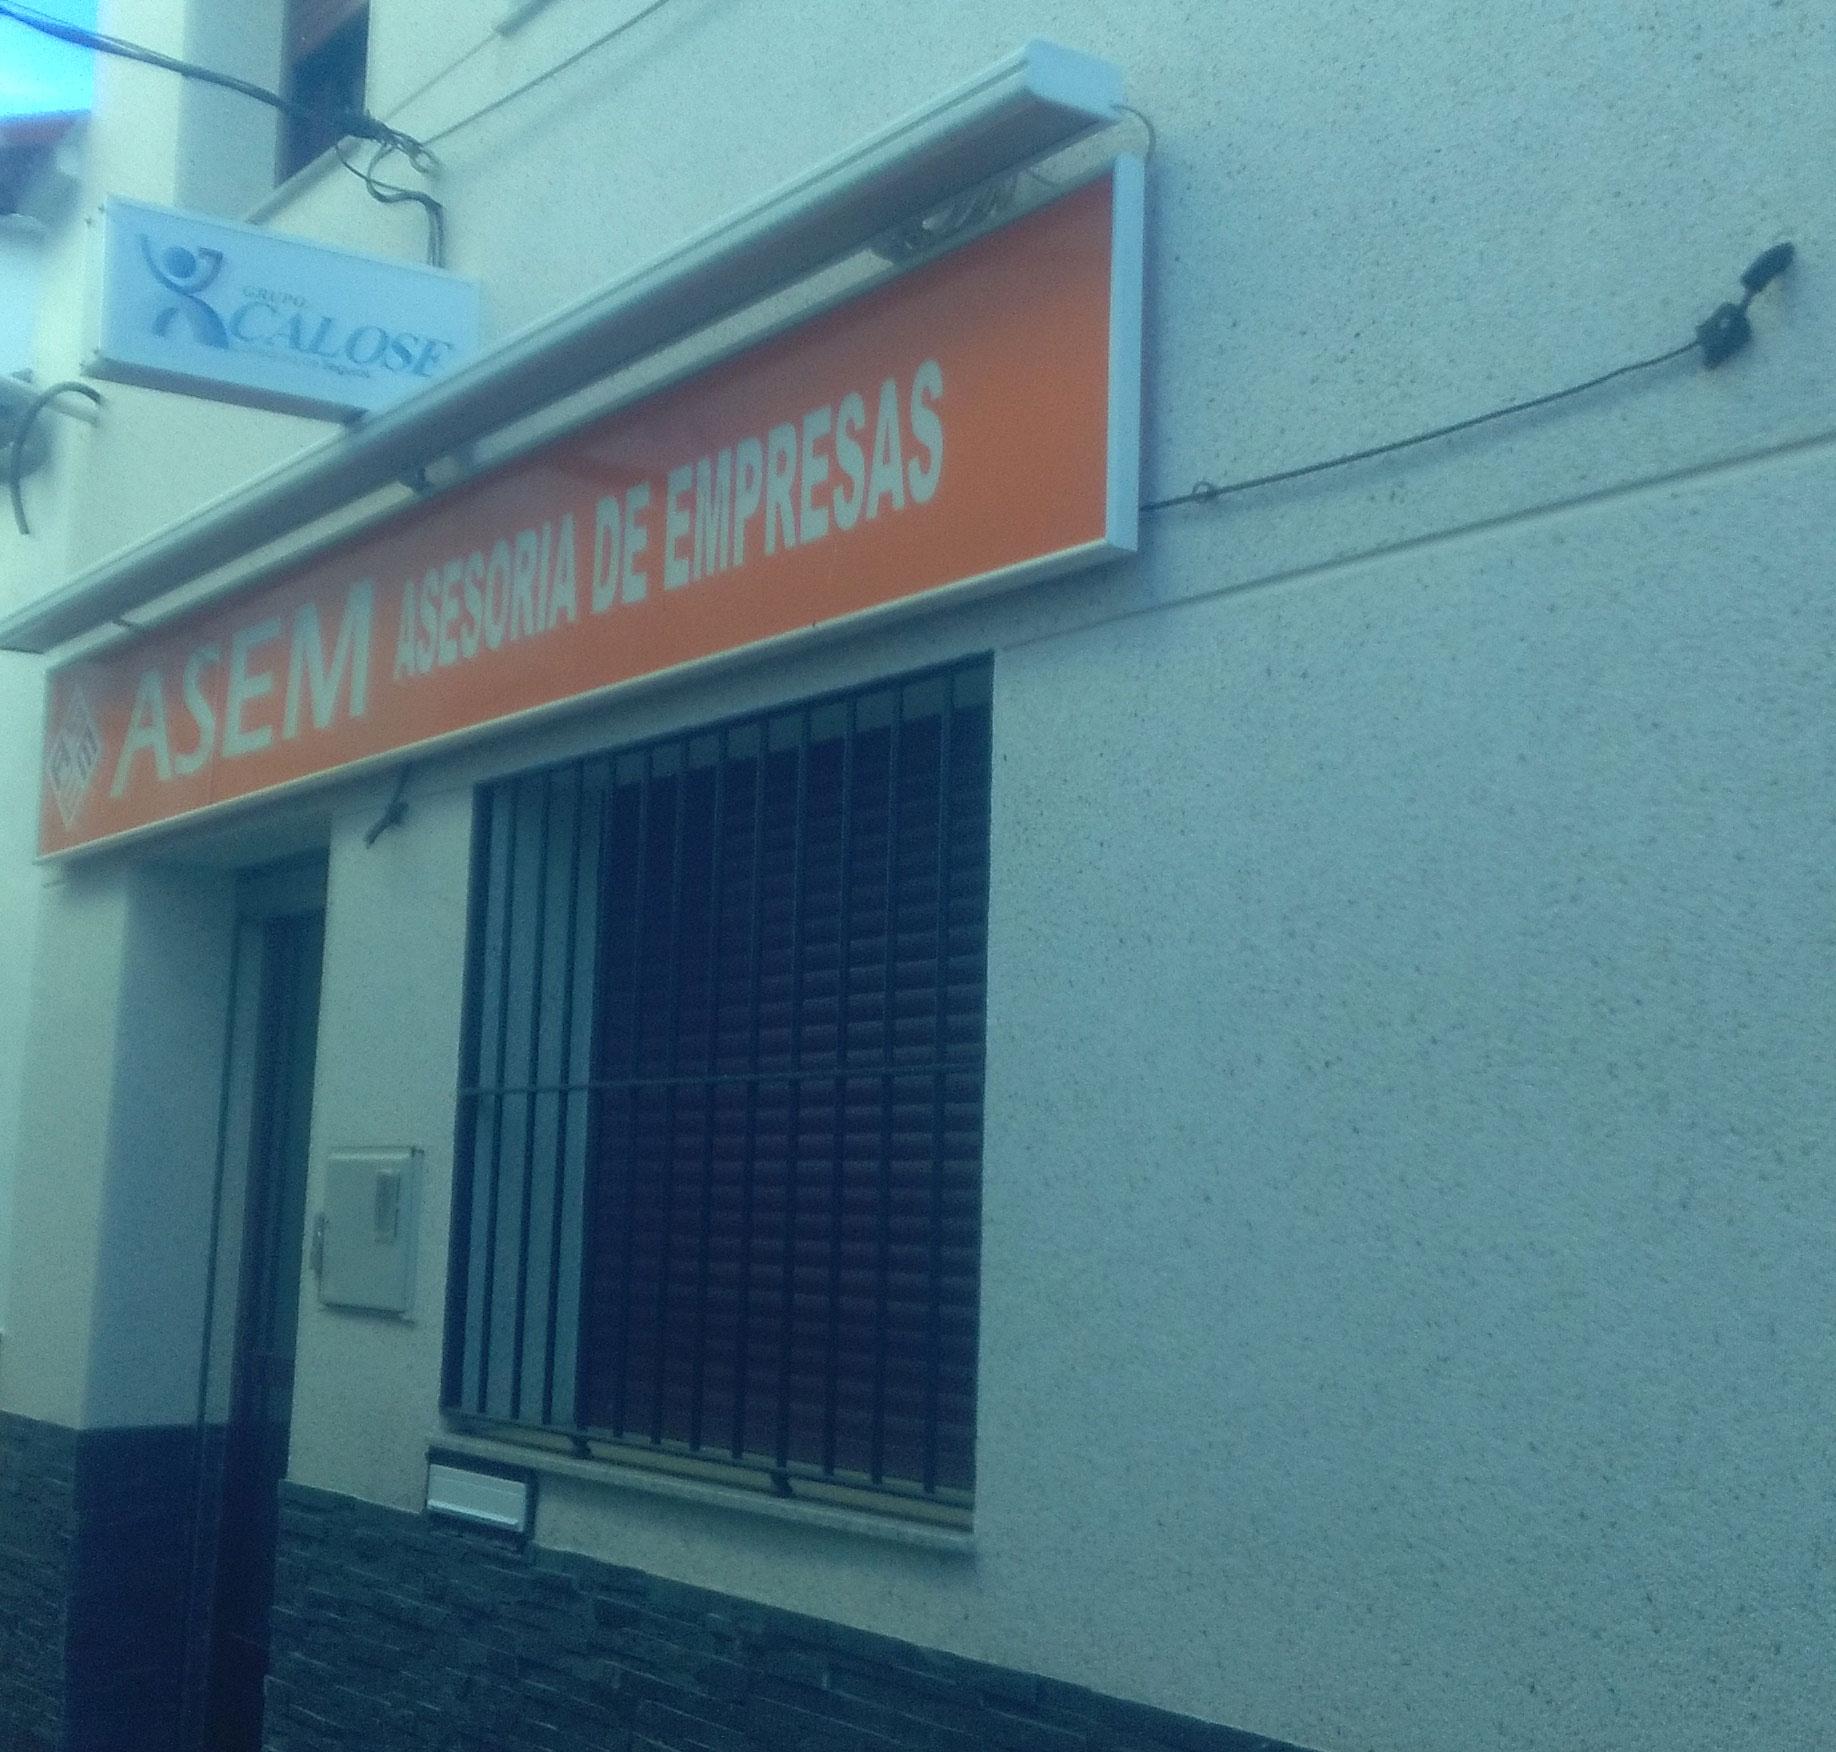 Oficina ASEM Aliseda